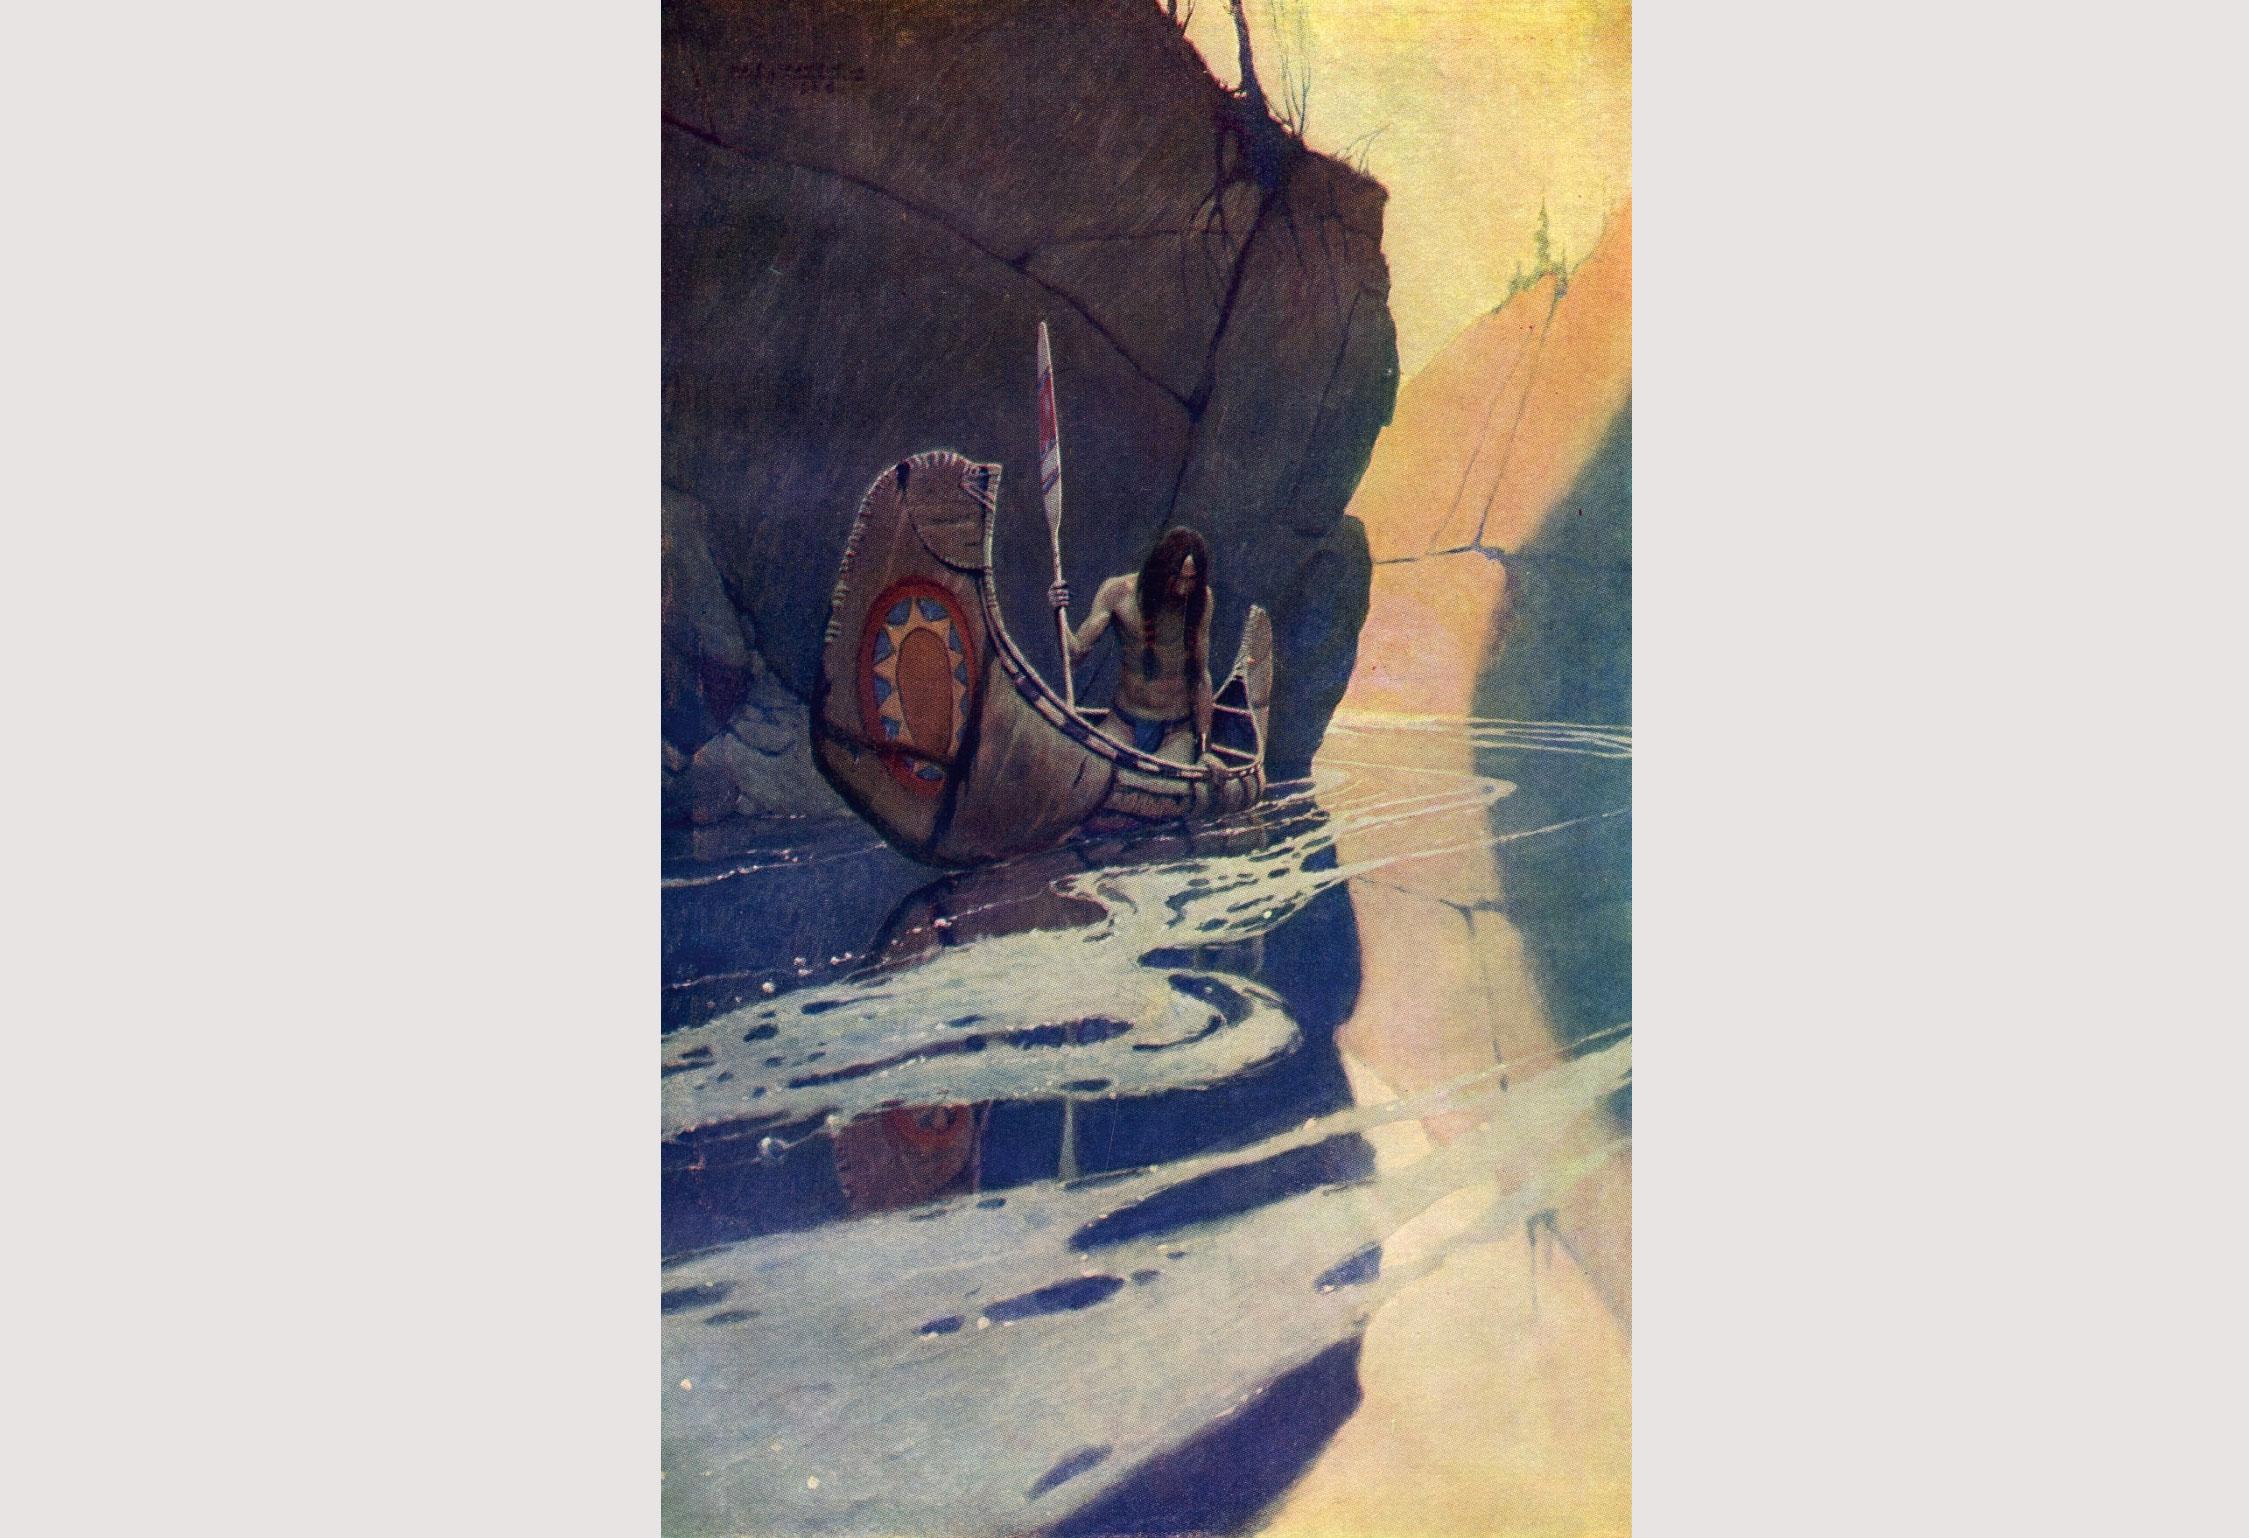 image of a man in a boat by a rock by NC Wyeth